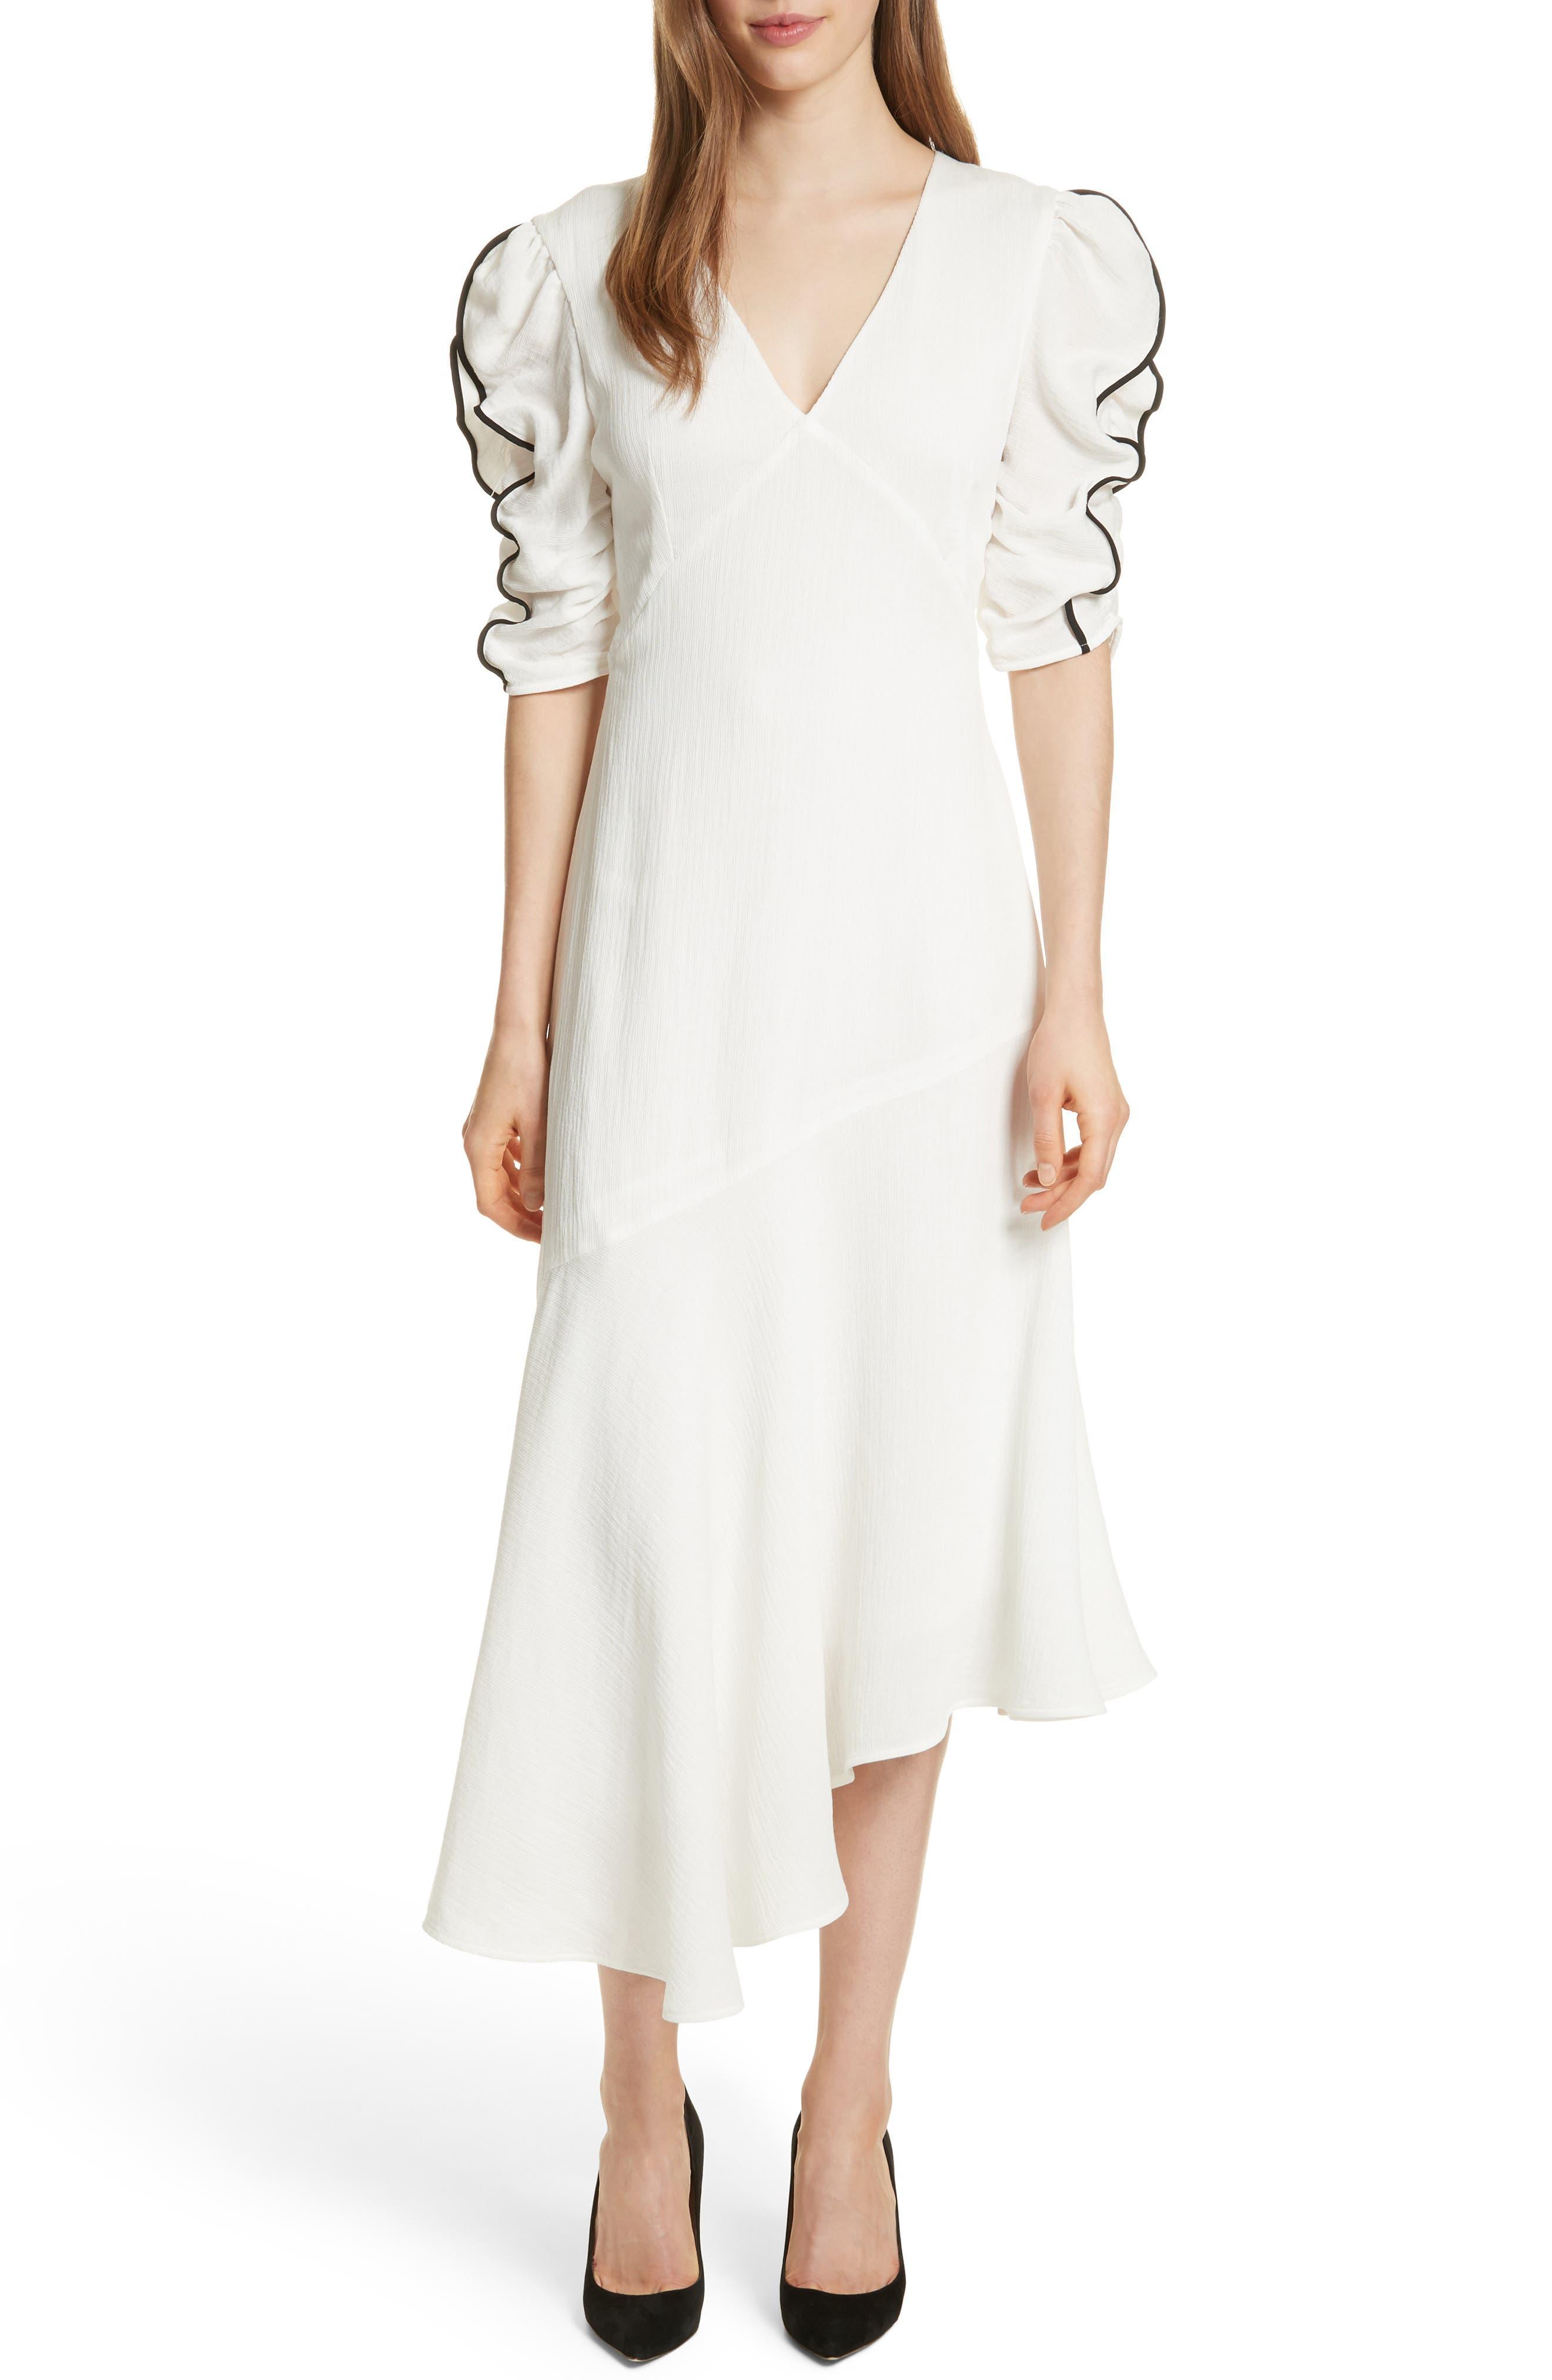 Prose & Poetry Shirley Ruffle Sleeve Midi Dress,                             Main thumbnail 1, color,                             101